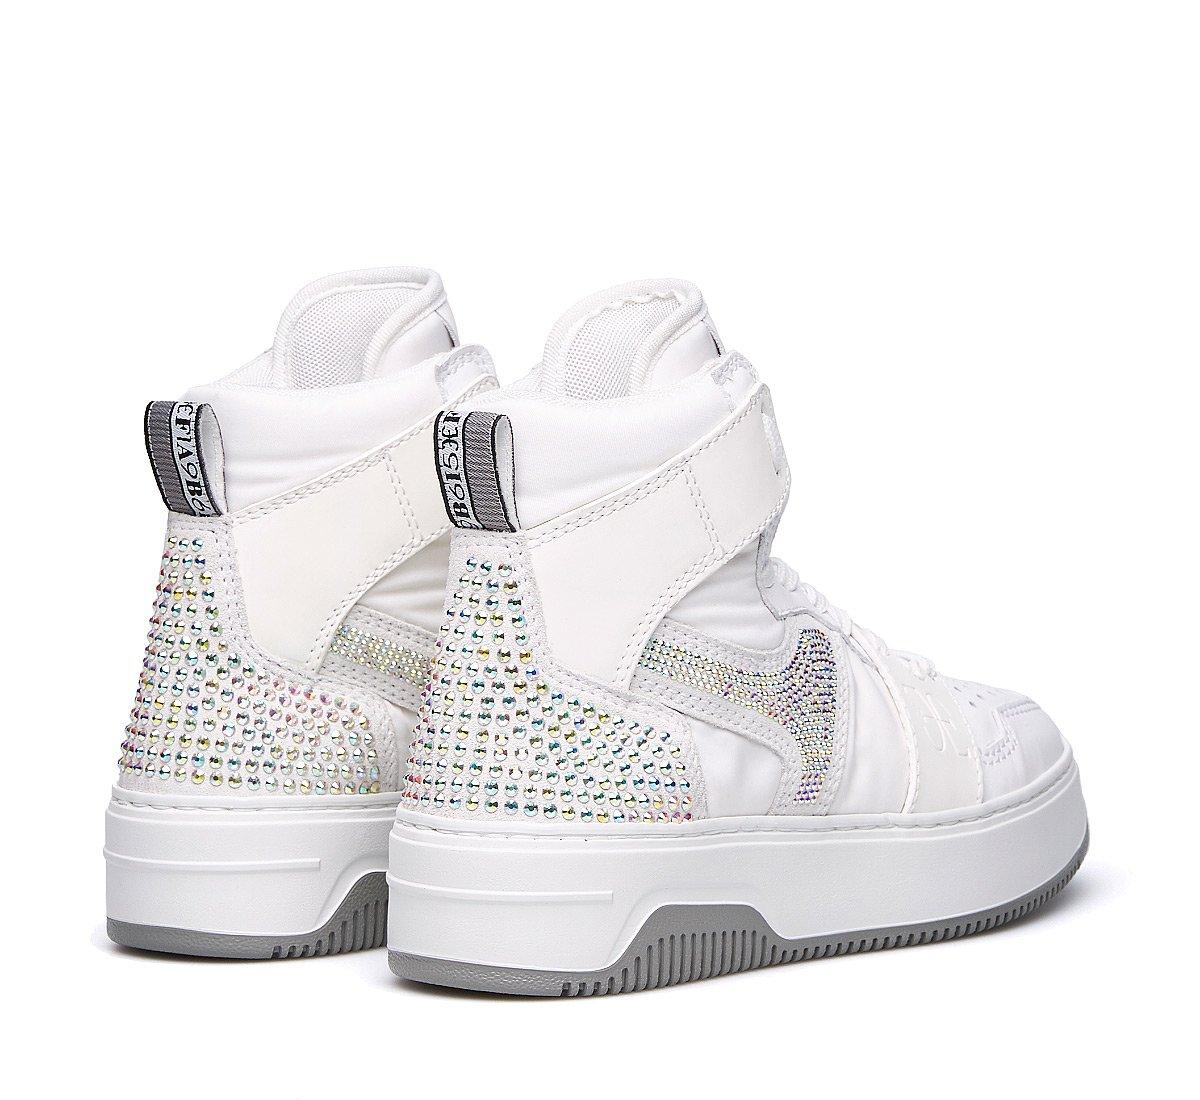 Fabi TwentyTwenty sneakers